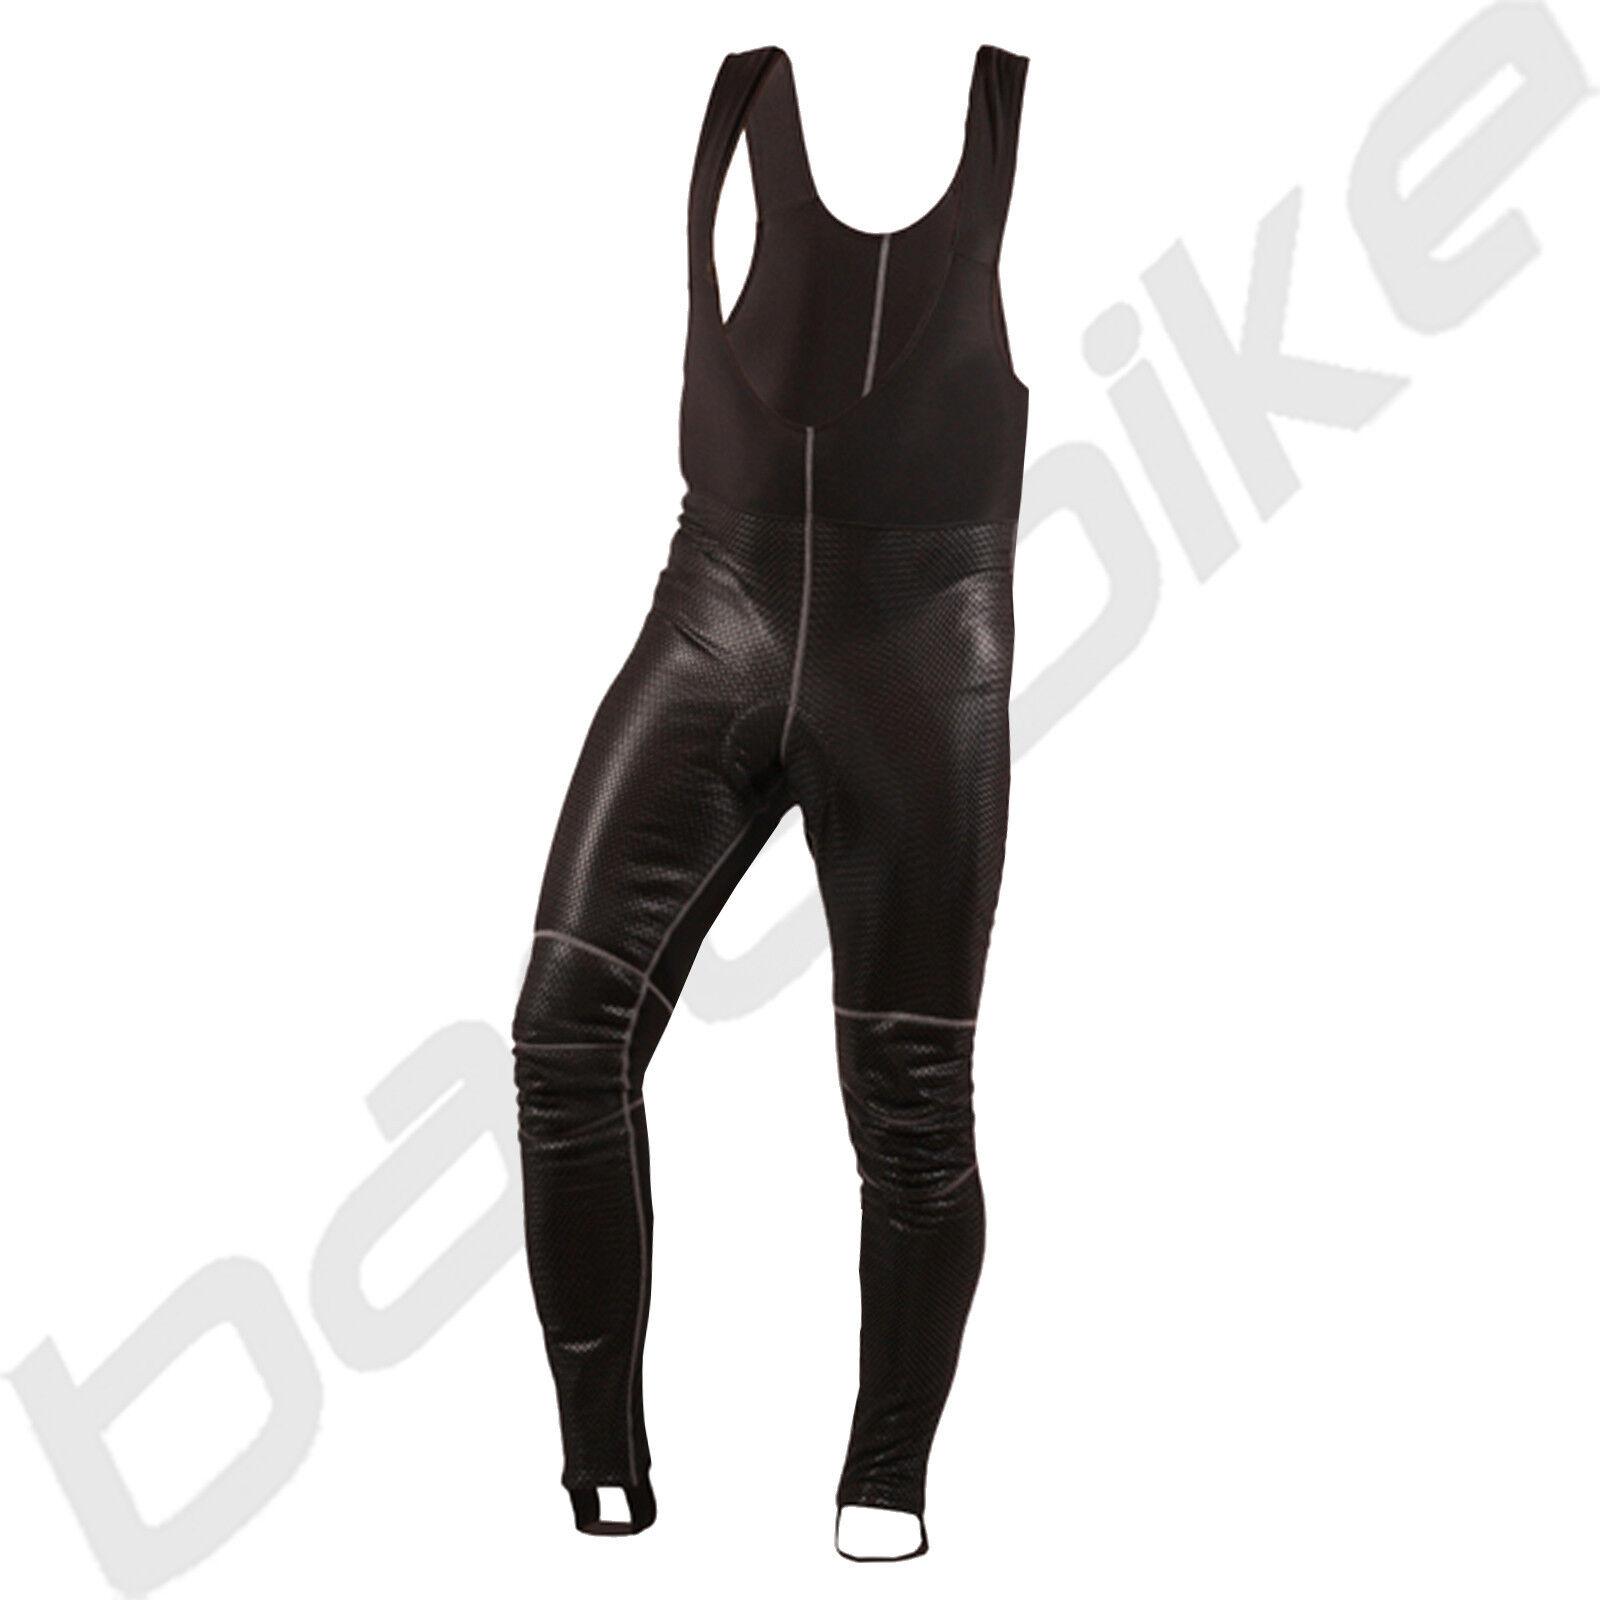 Lang Radler travi Pantaloni Pantaloni Softshell membrana WINDSTOP inverno Tg. BICICLETTA Tg. inverno XXXL e0804c